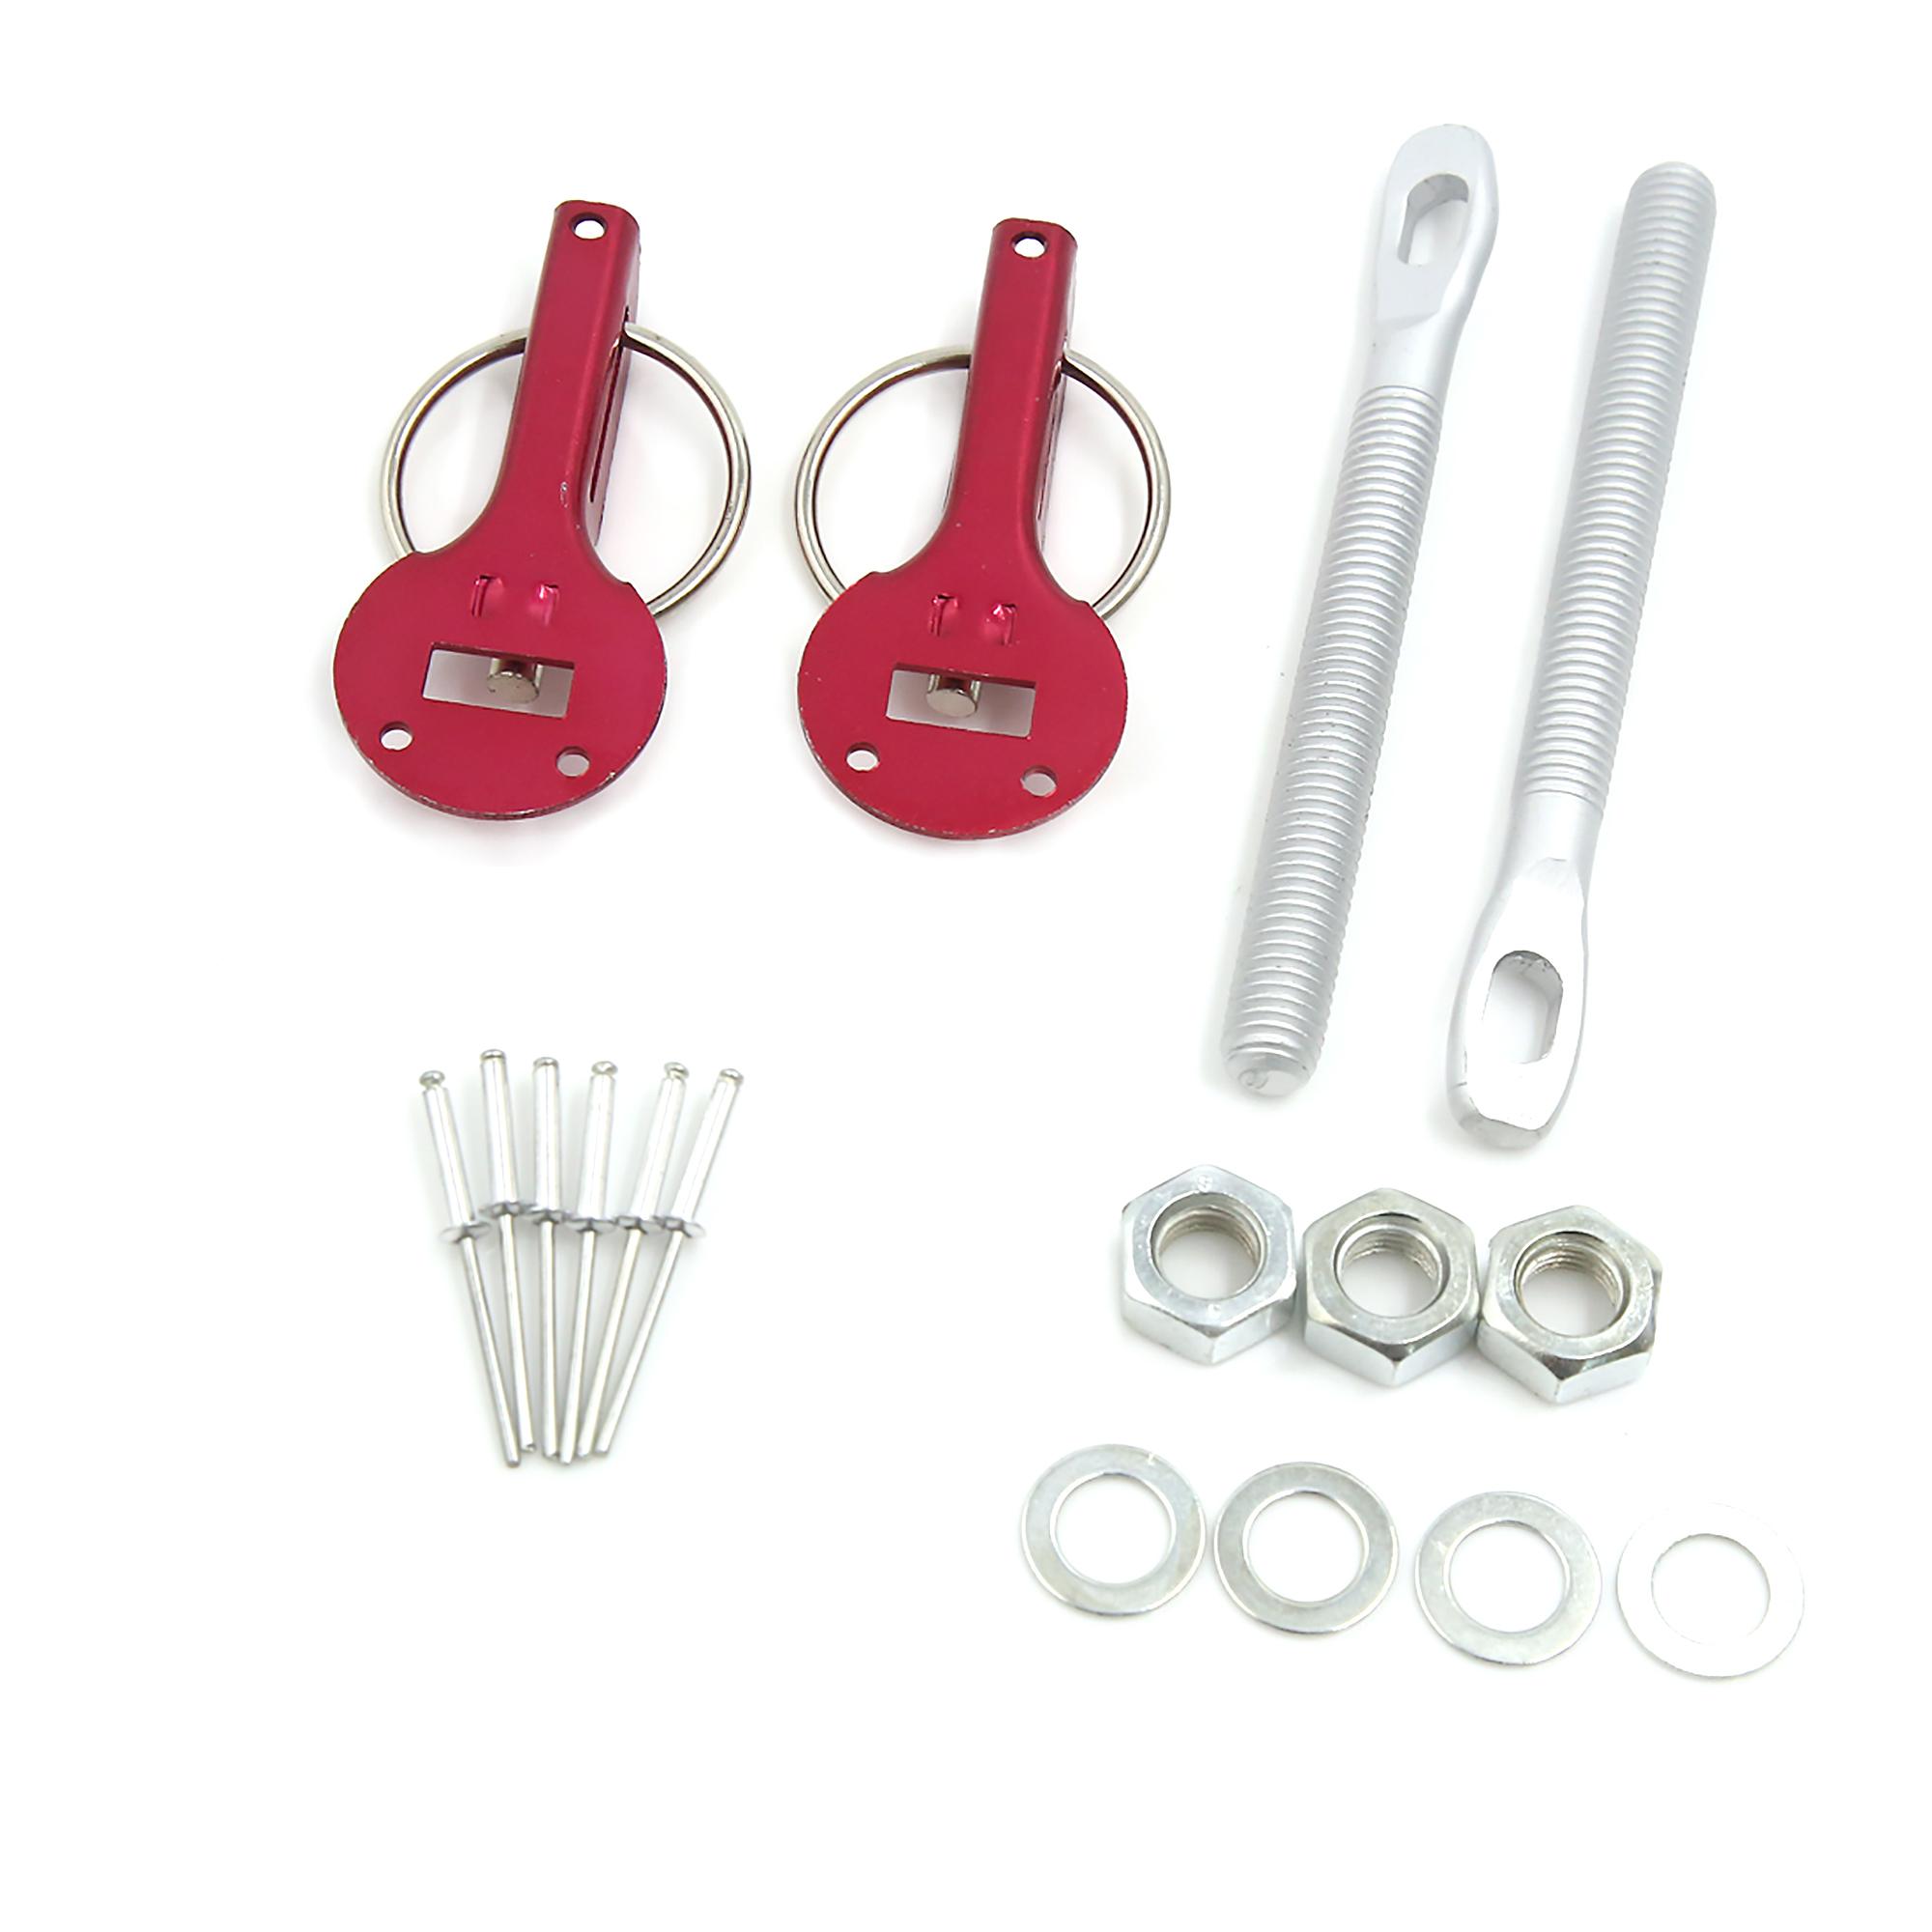 Universal Racing Car Aluminum Alloy Mount Clasp Hood Pin Lock Fastener Kit Red